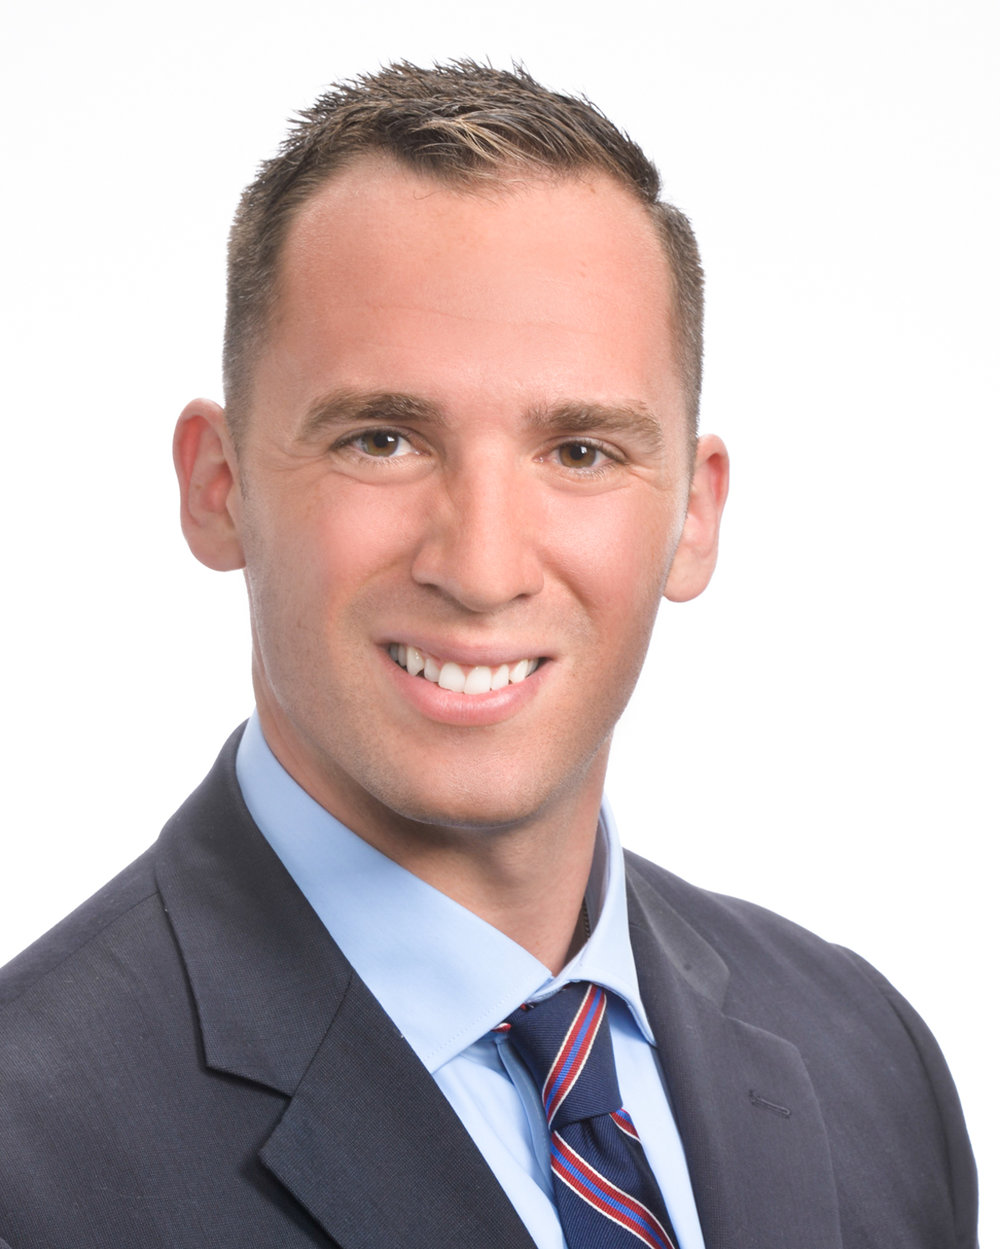 Scott A. Oliver - Associate